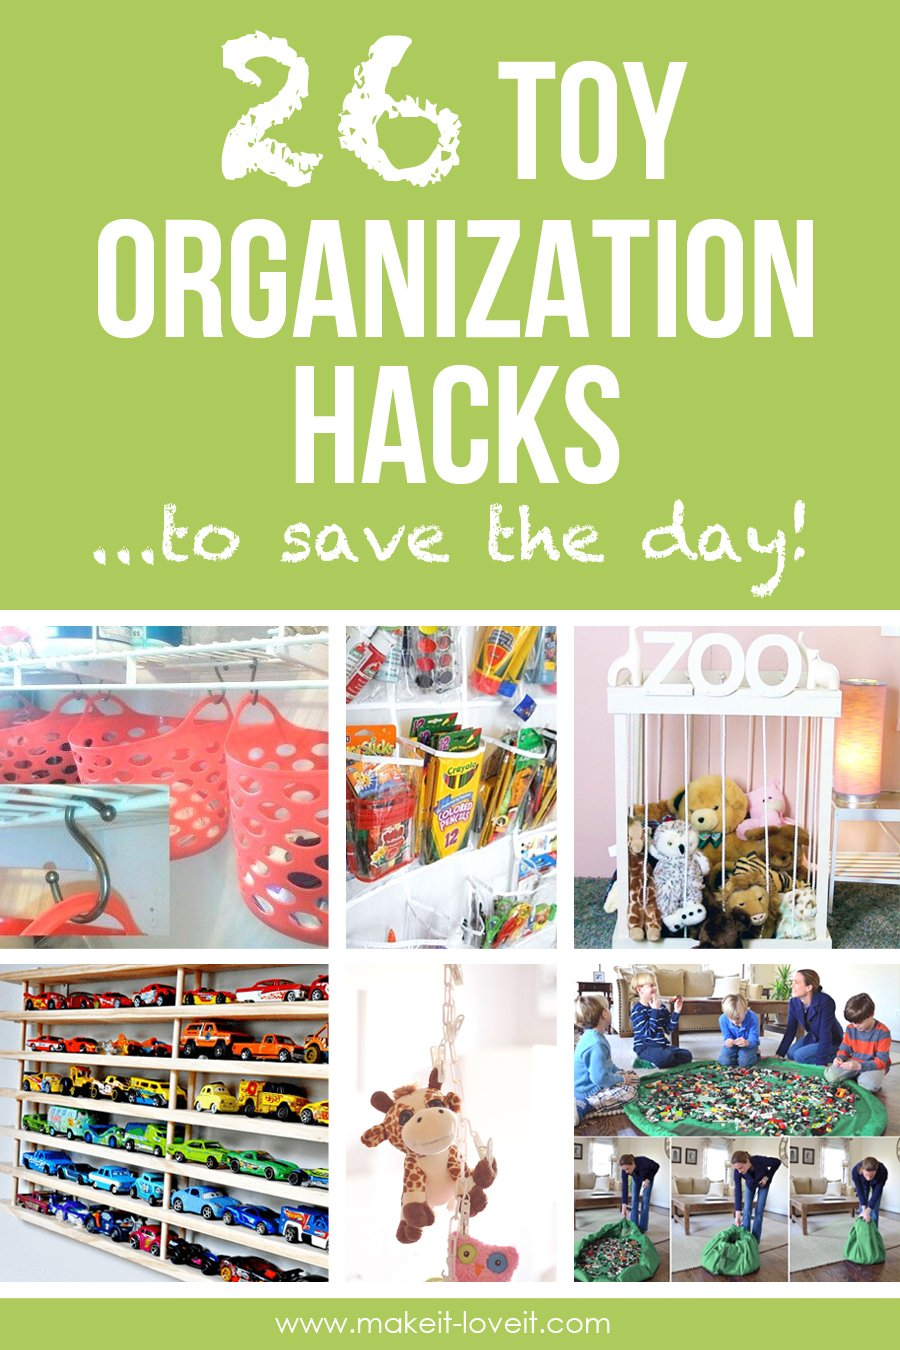 26 Toy Organization Hacks...to Save the Day!! | via www.makeit-loveit.com